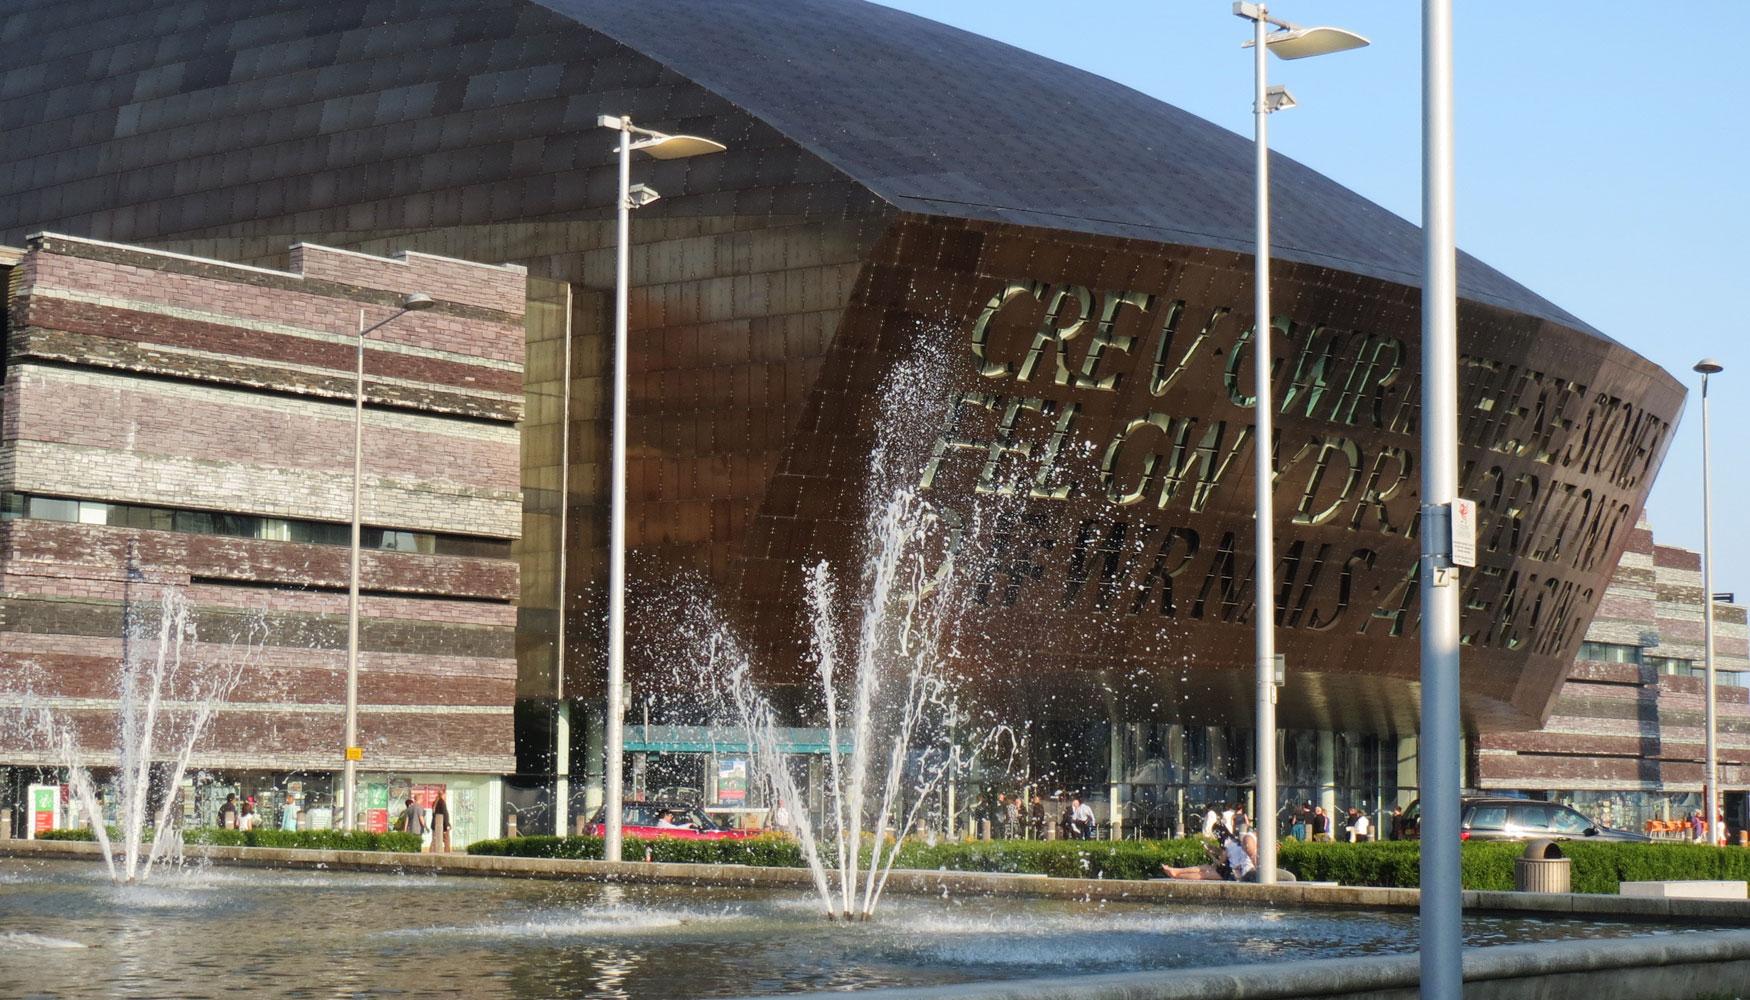 Wales millennium centre, Cardiff